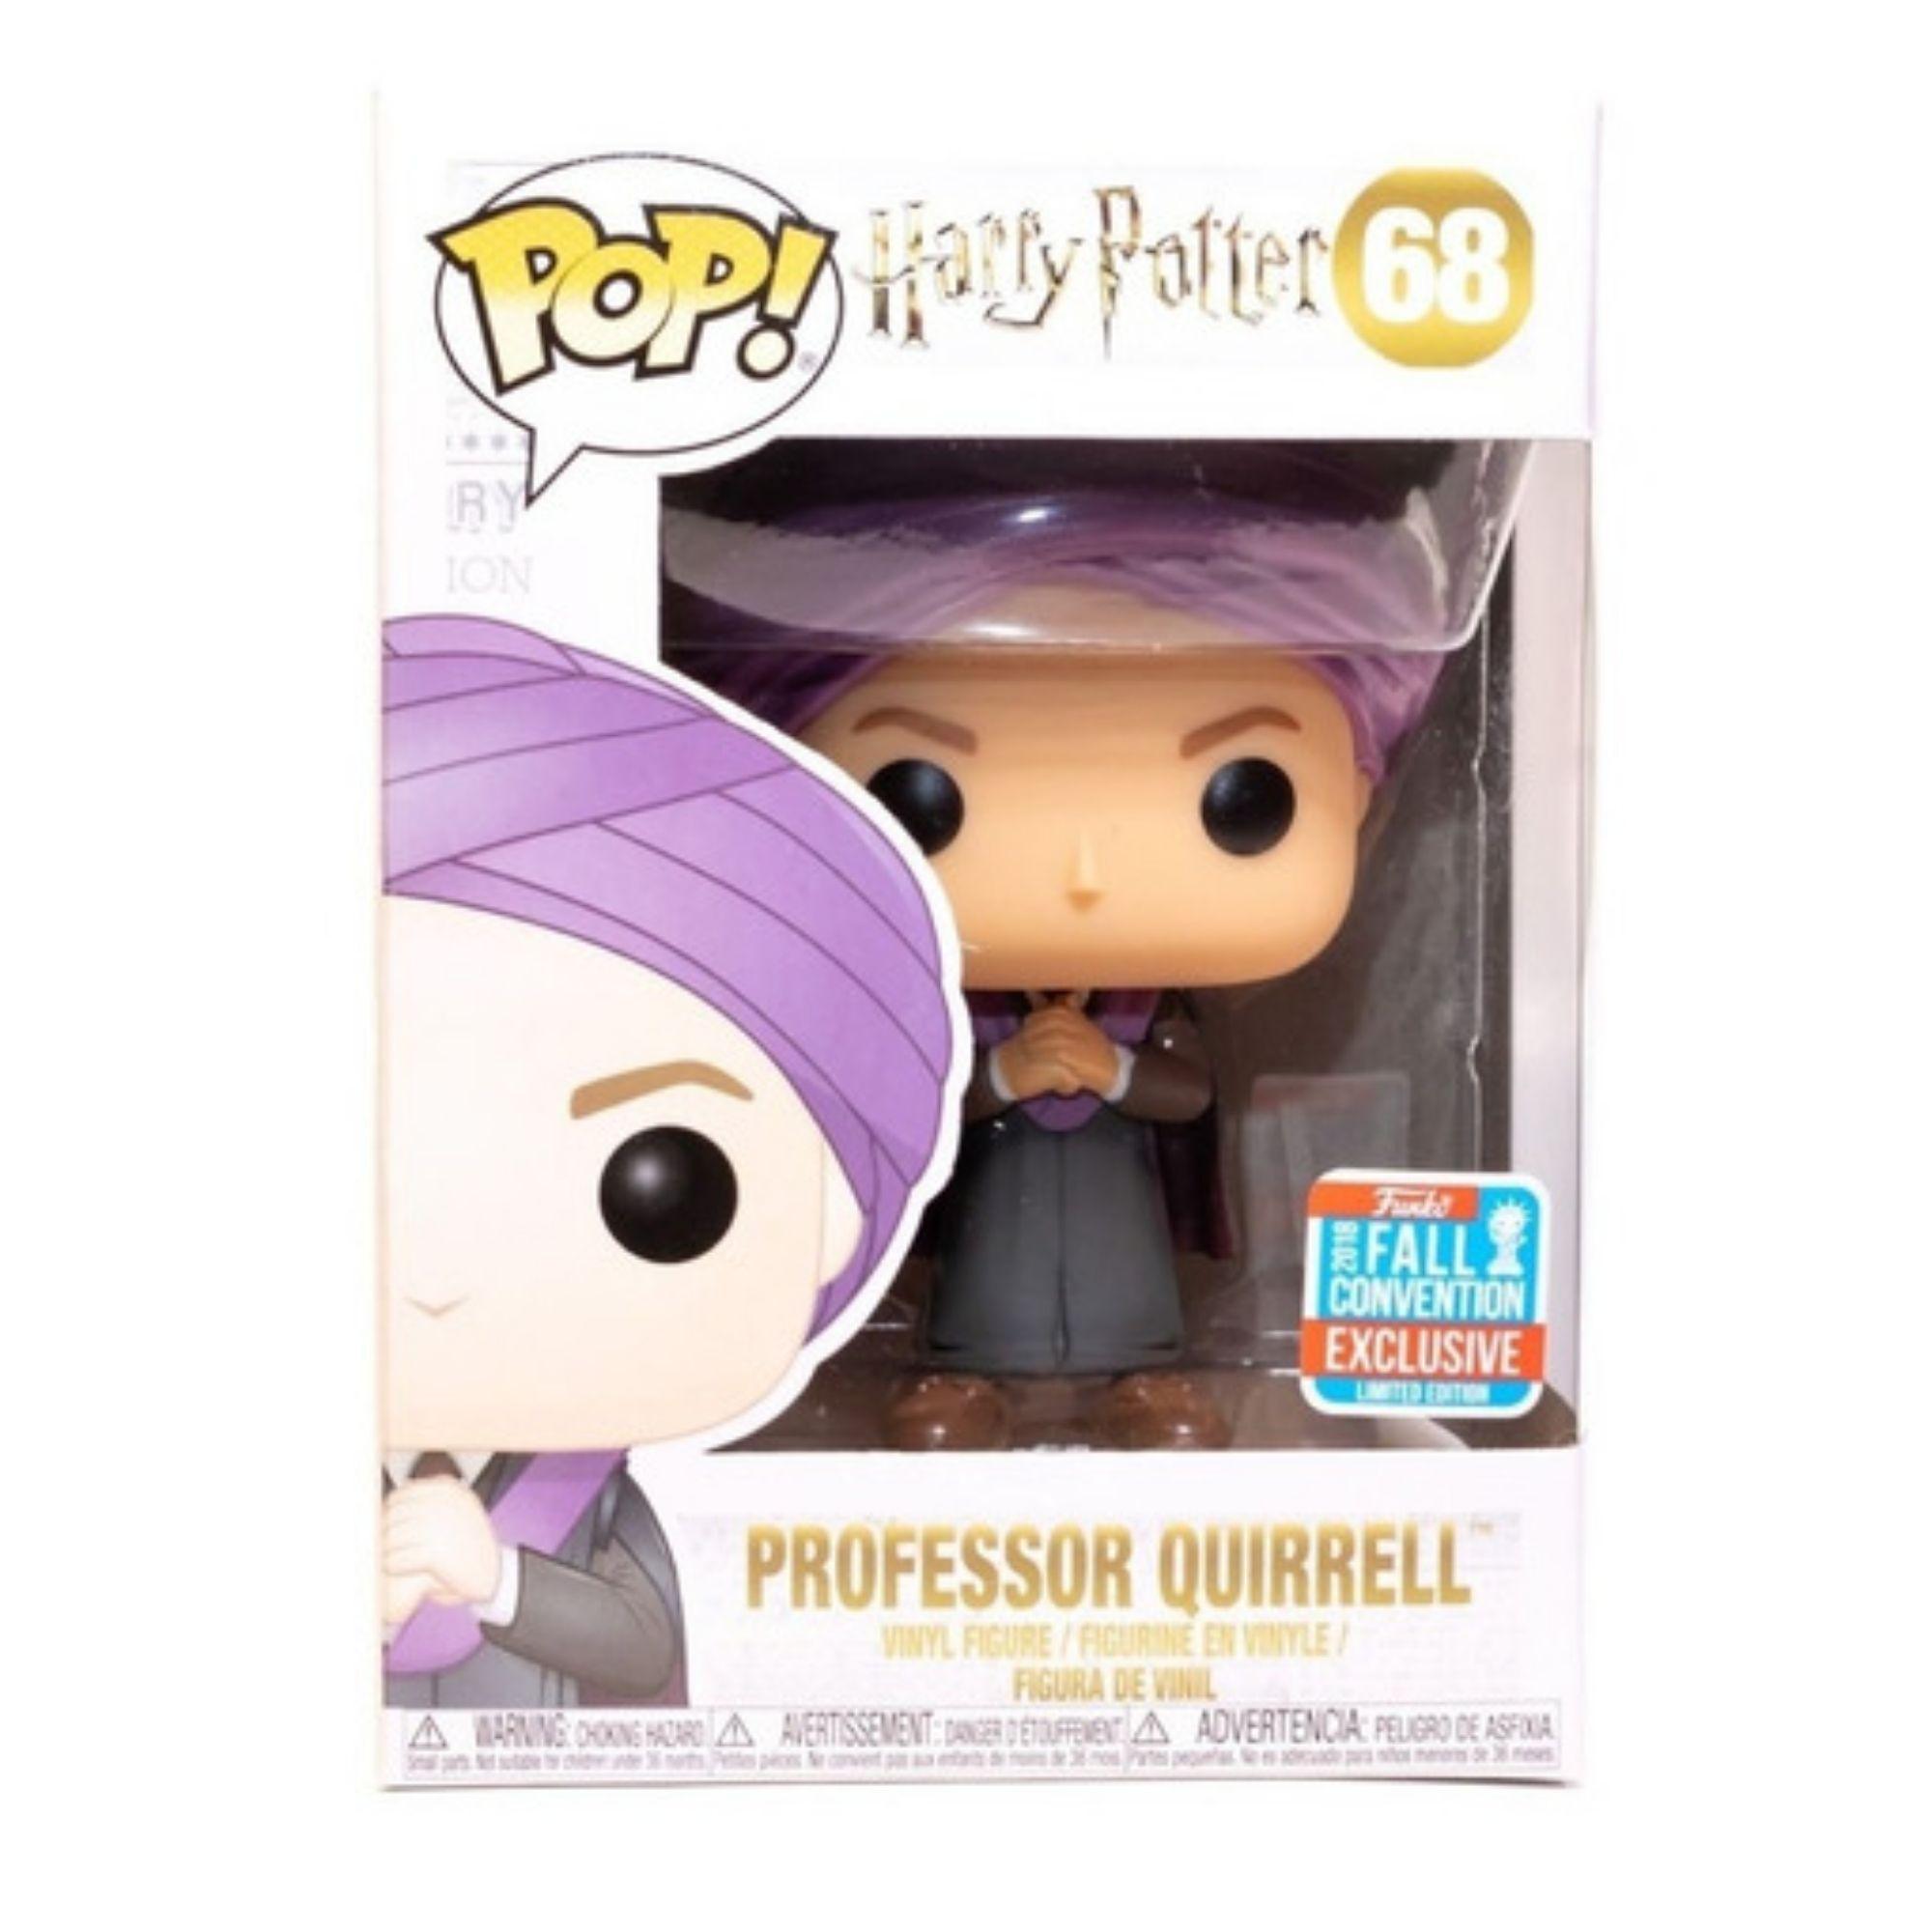 Funko Pop Harry Potter Professor Quirrell #68  - Game Land Brinquedos